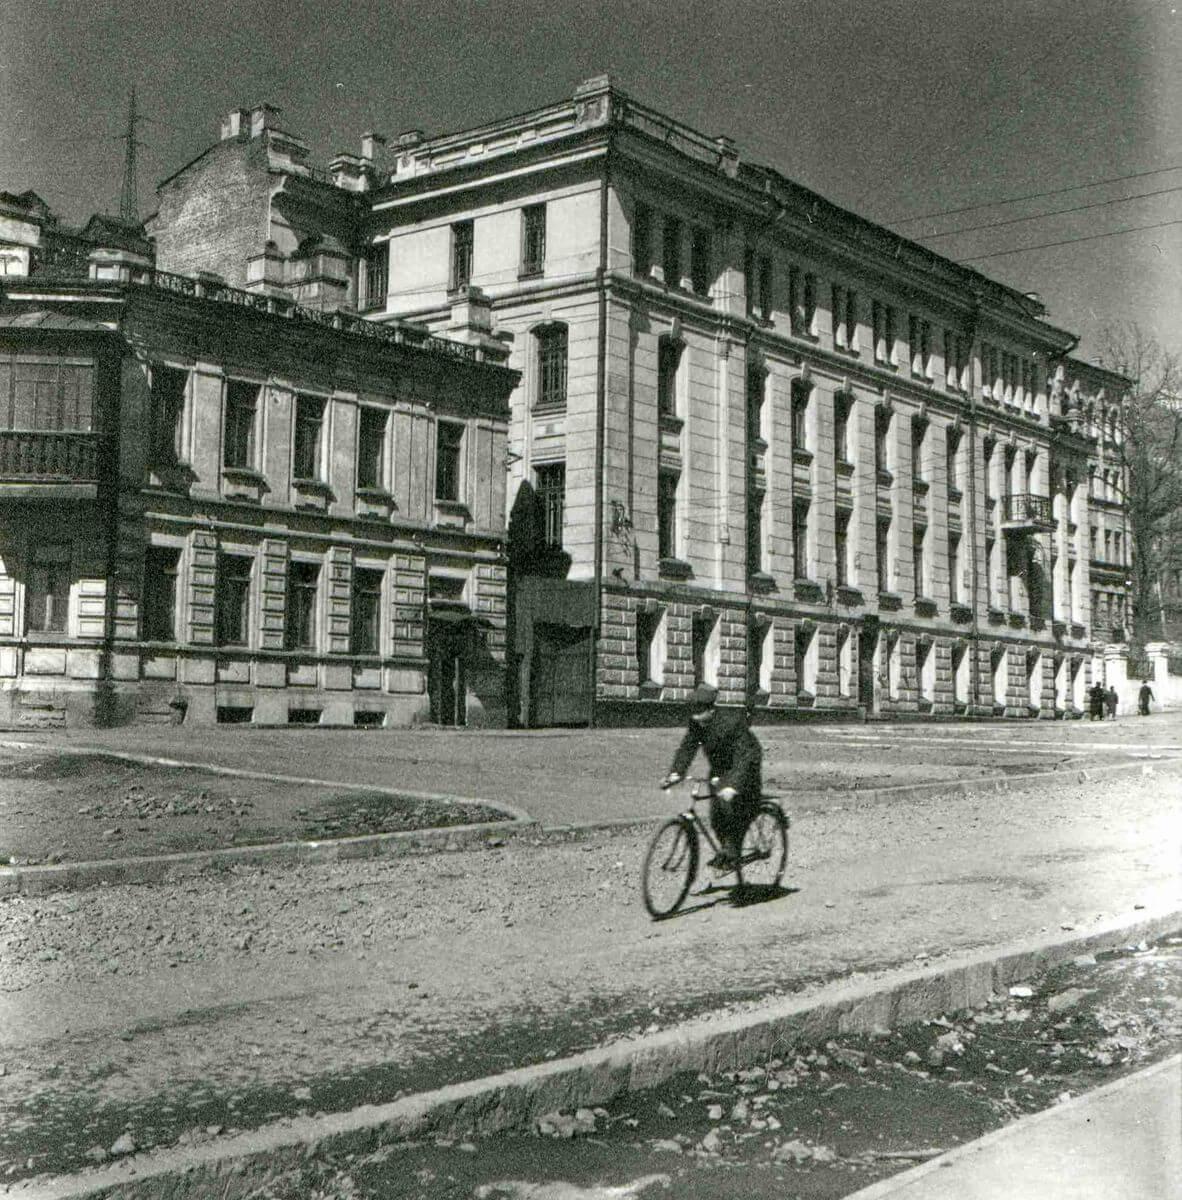 Улица Пушкинская. Средняя школа № 9. 1960-е годы.